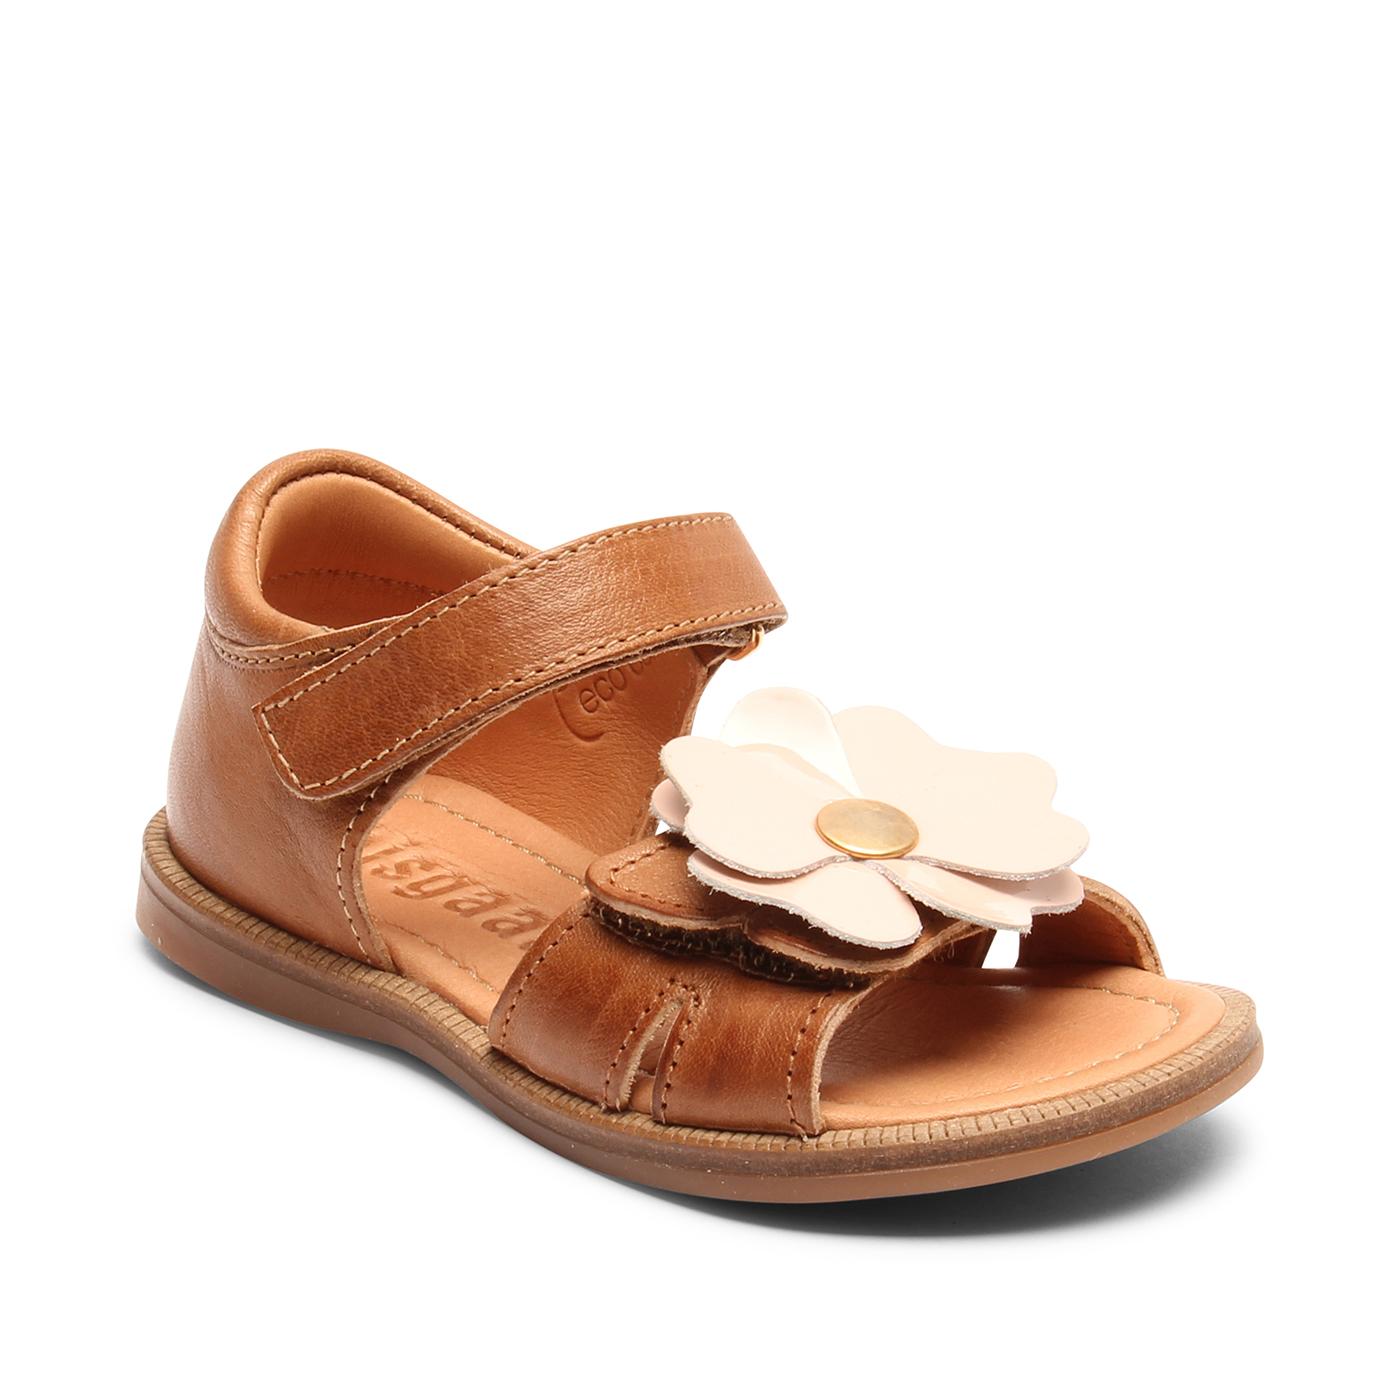 Bisgaard sandaler, brun, 32